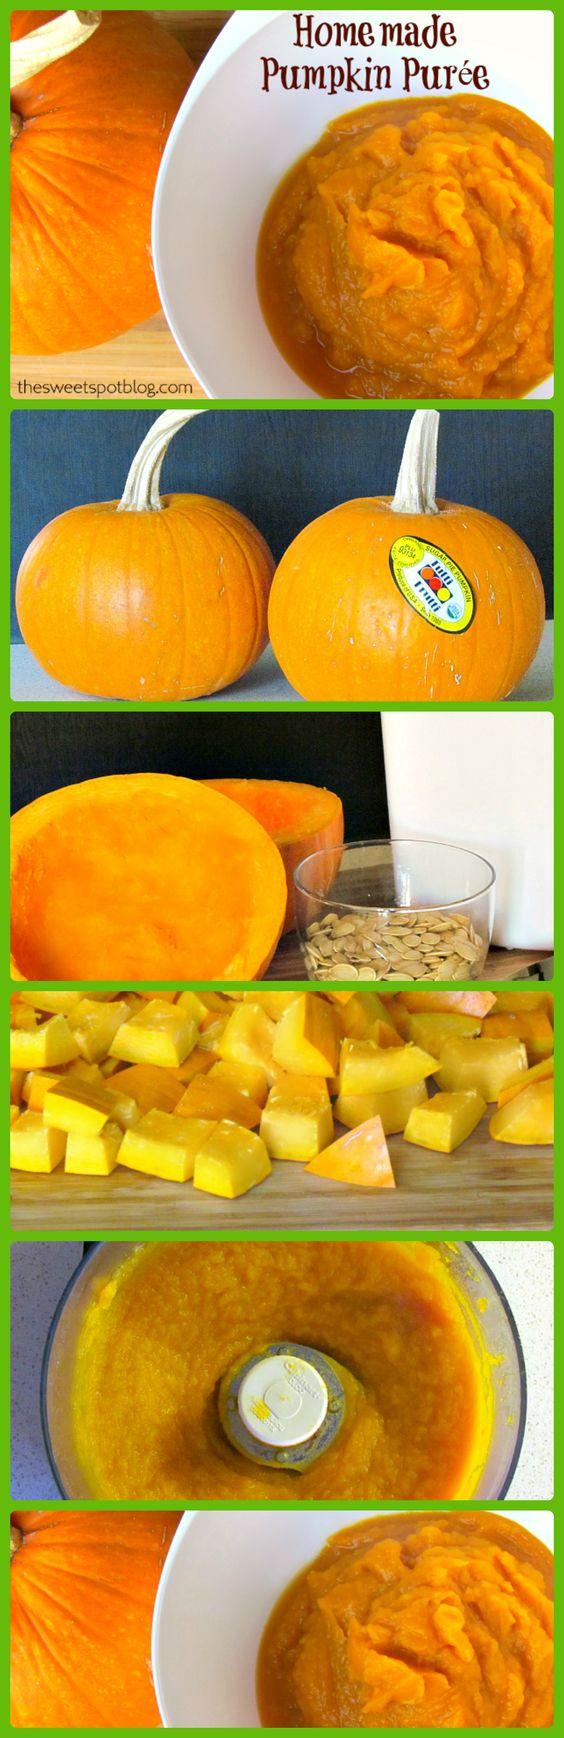 Pumpkin Pur E Homemade Organic Pinterest Homemade How To Make Homemade And Thanksgiving